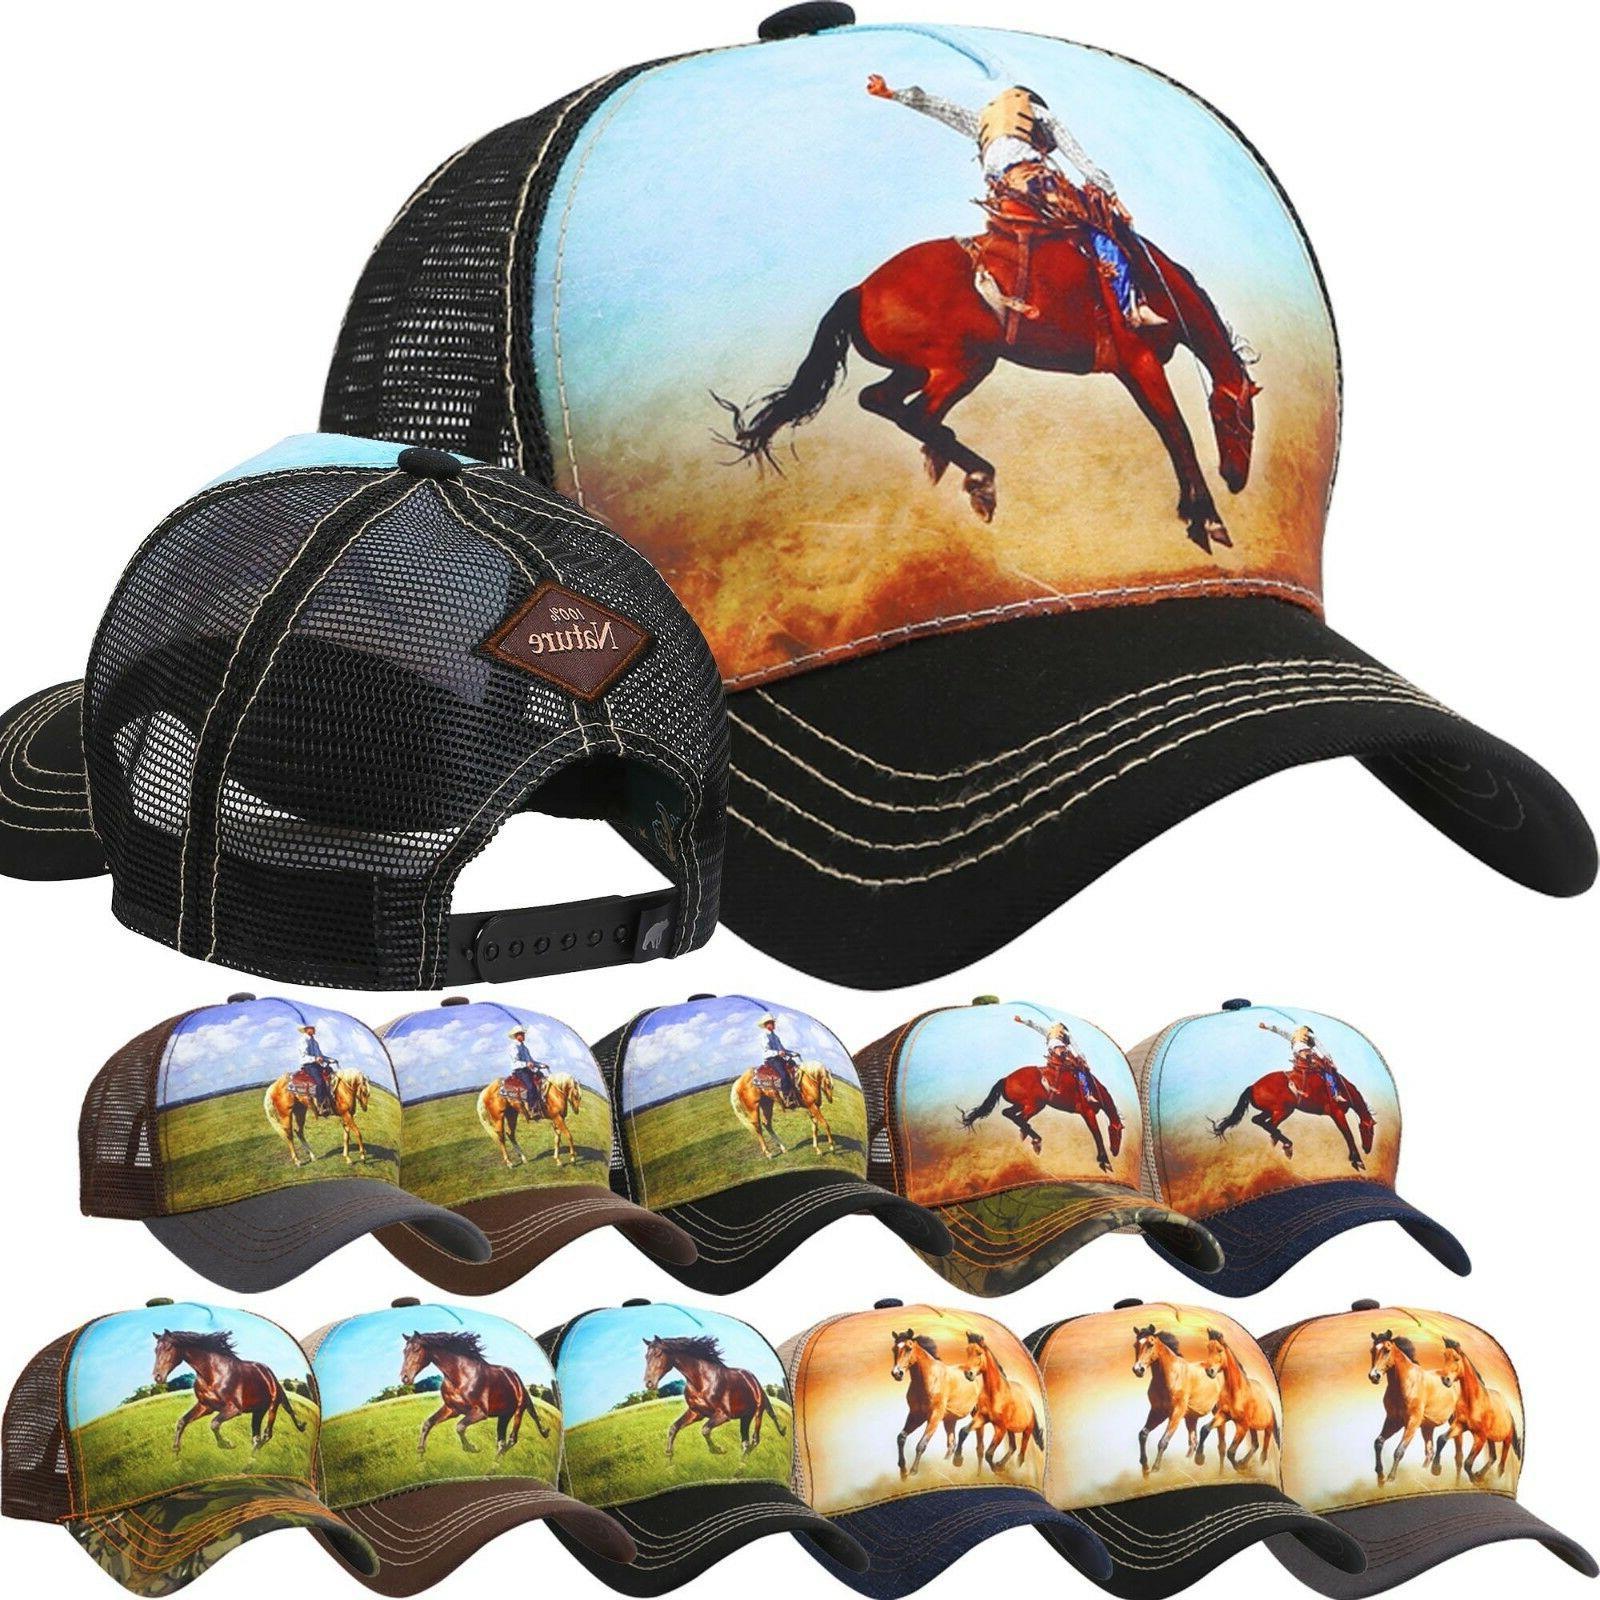 bb trucker hat animal farm horse baseball